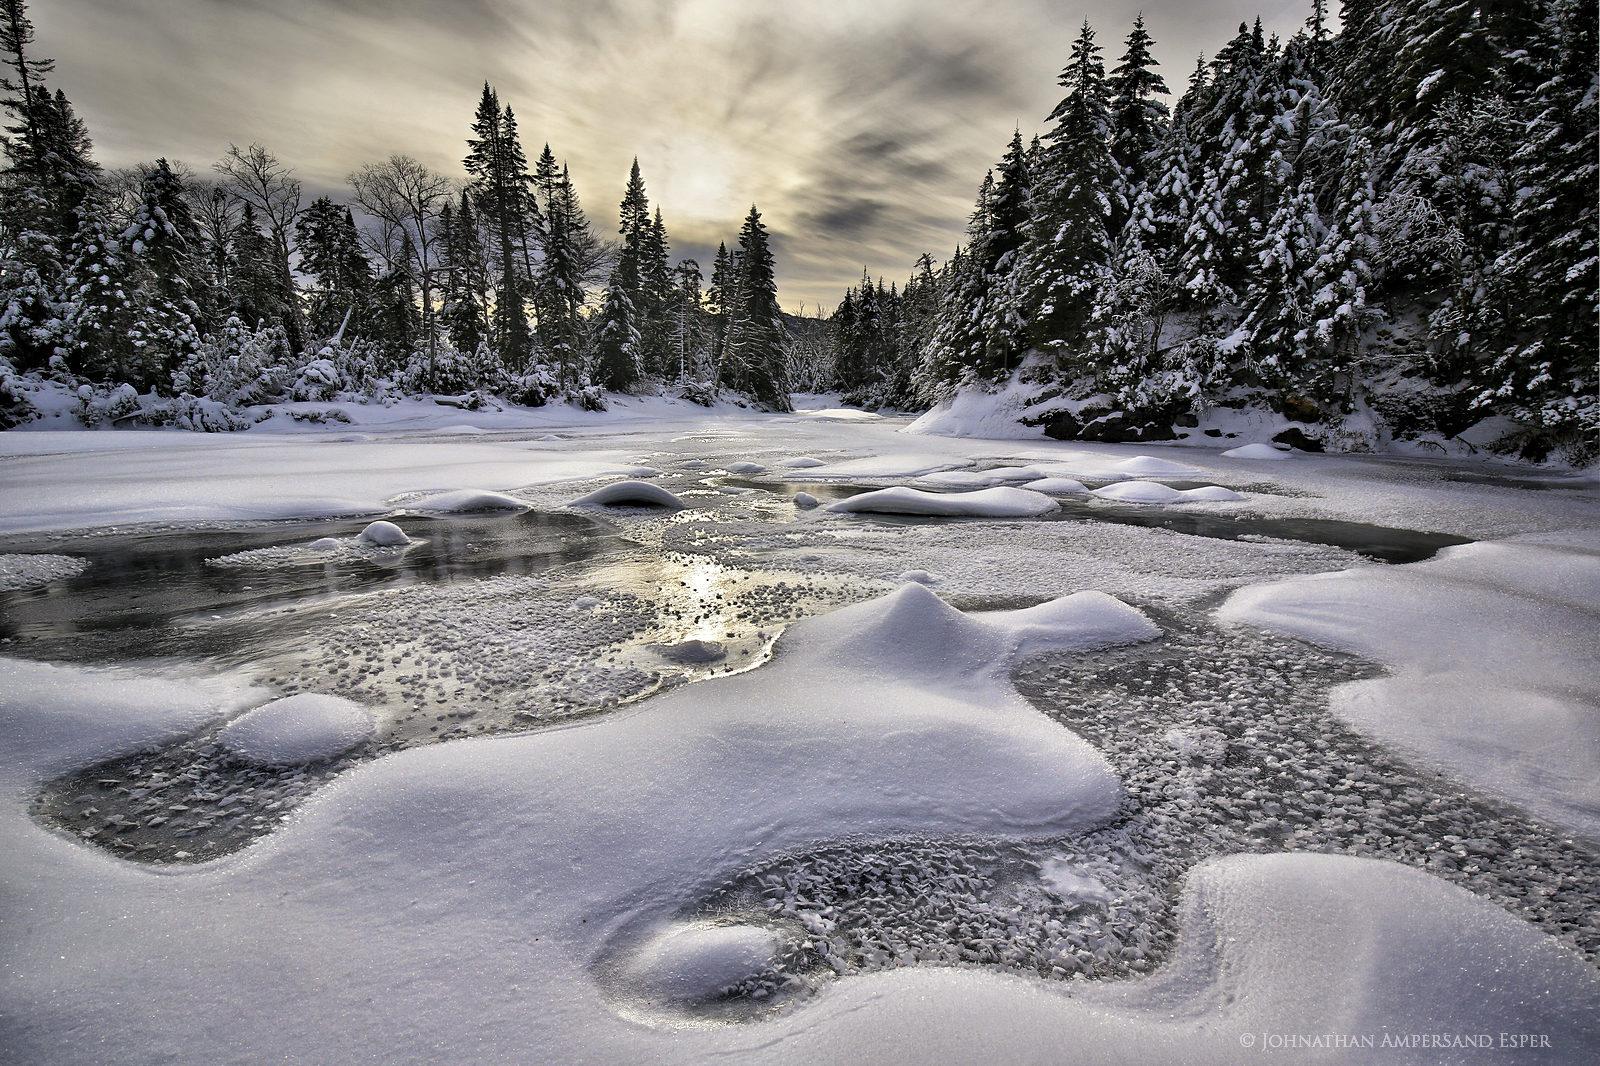 Flowed Lands,Opalescent River,snow,curves,patterns,ice,snowy,winter,High Peaks,High Peaks region,Adirondack High Peaks,, photo